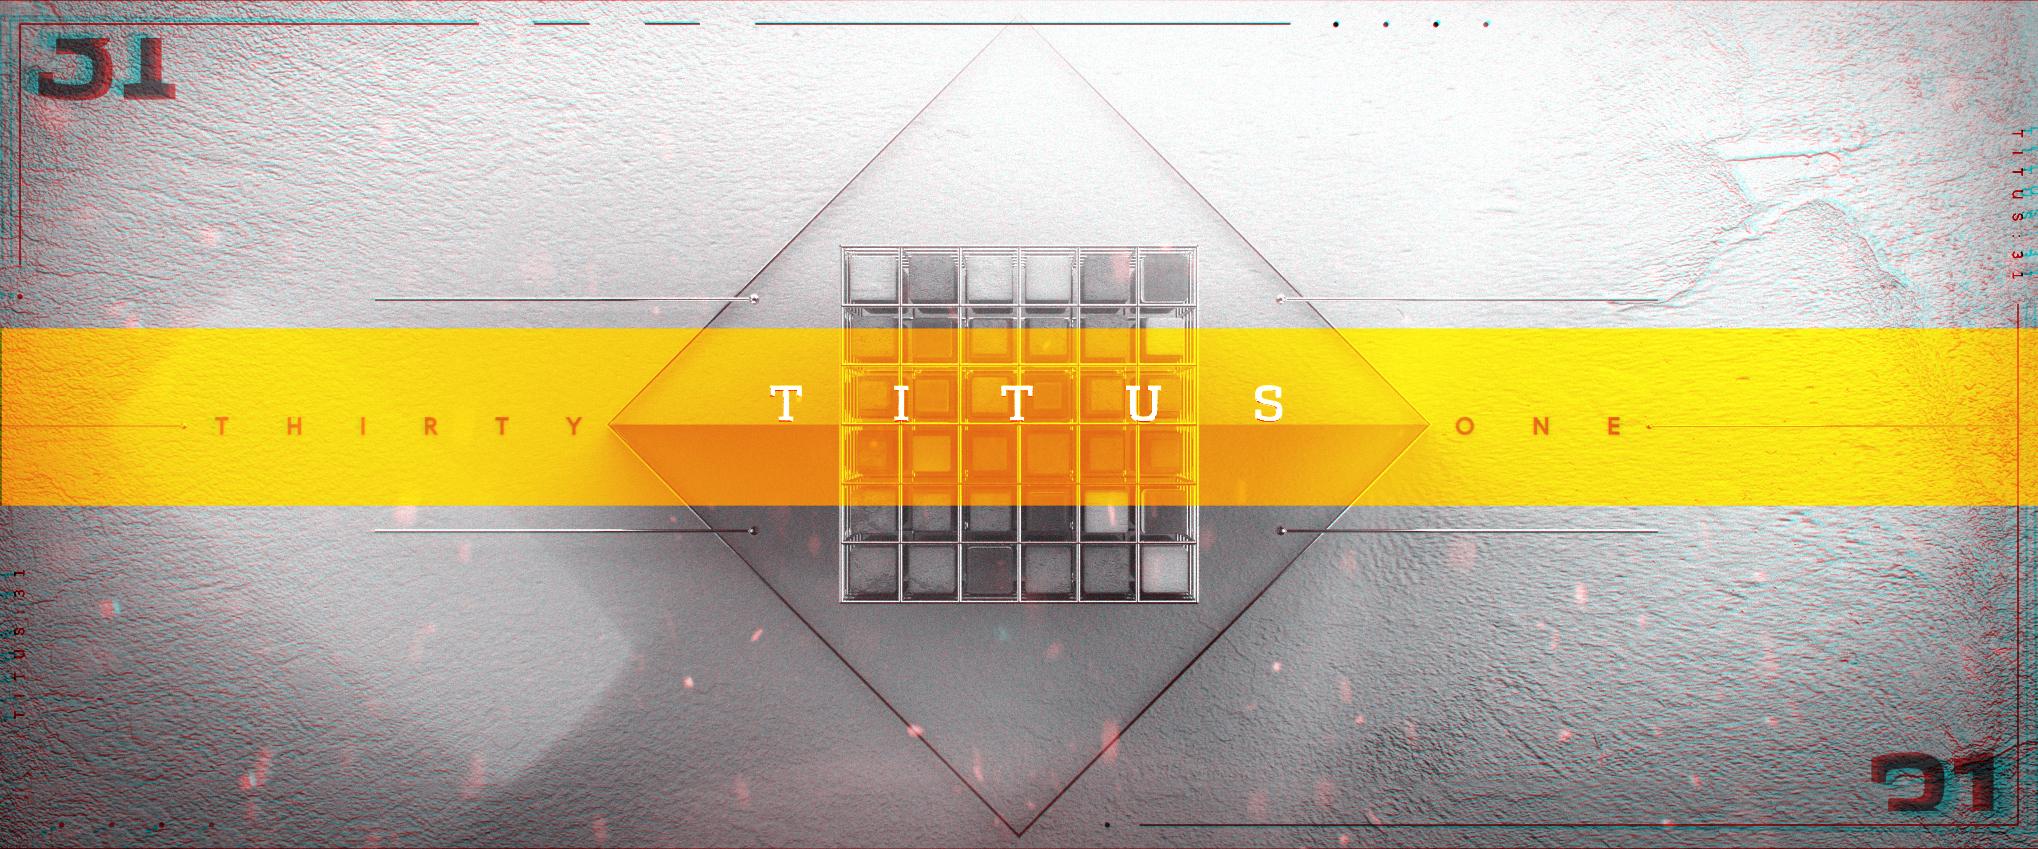 TITUS 31 Frame_03